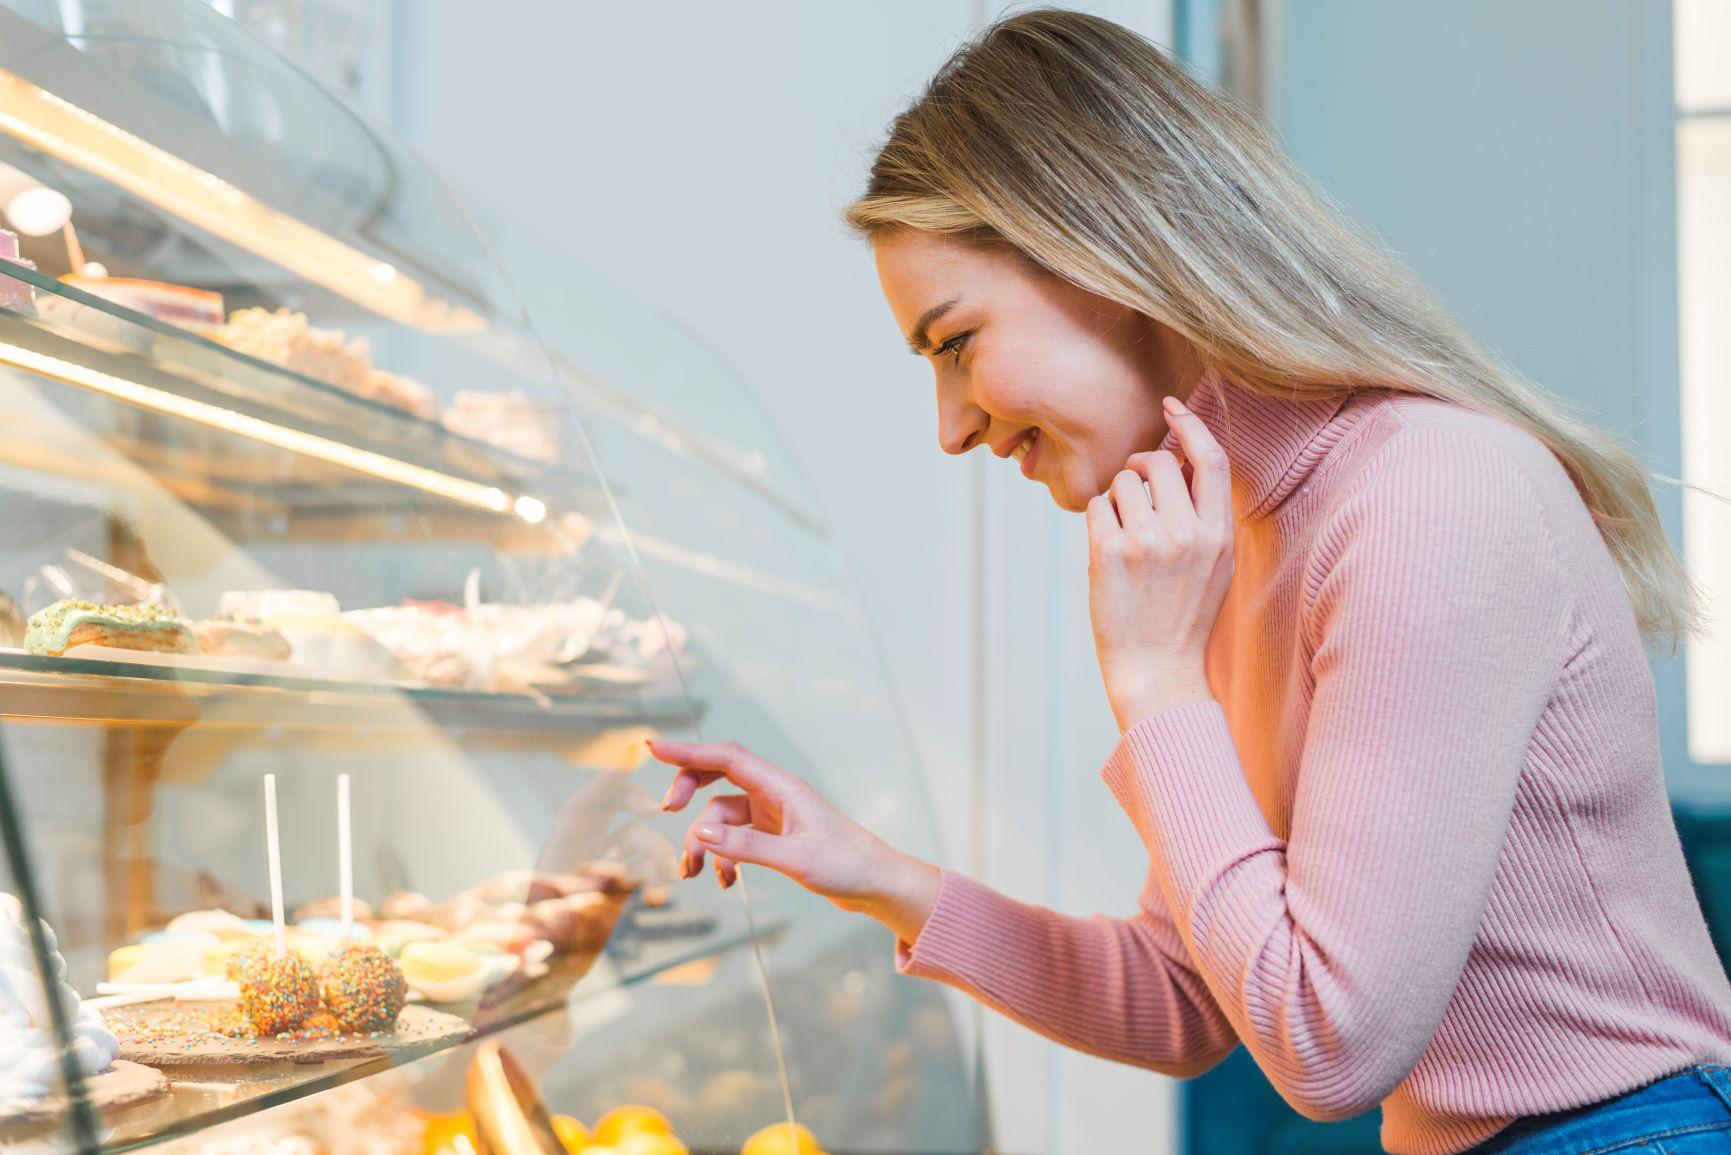 Aprenda a gerenciar as expectativas dos seus clientes